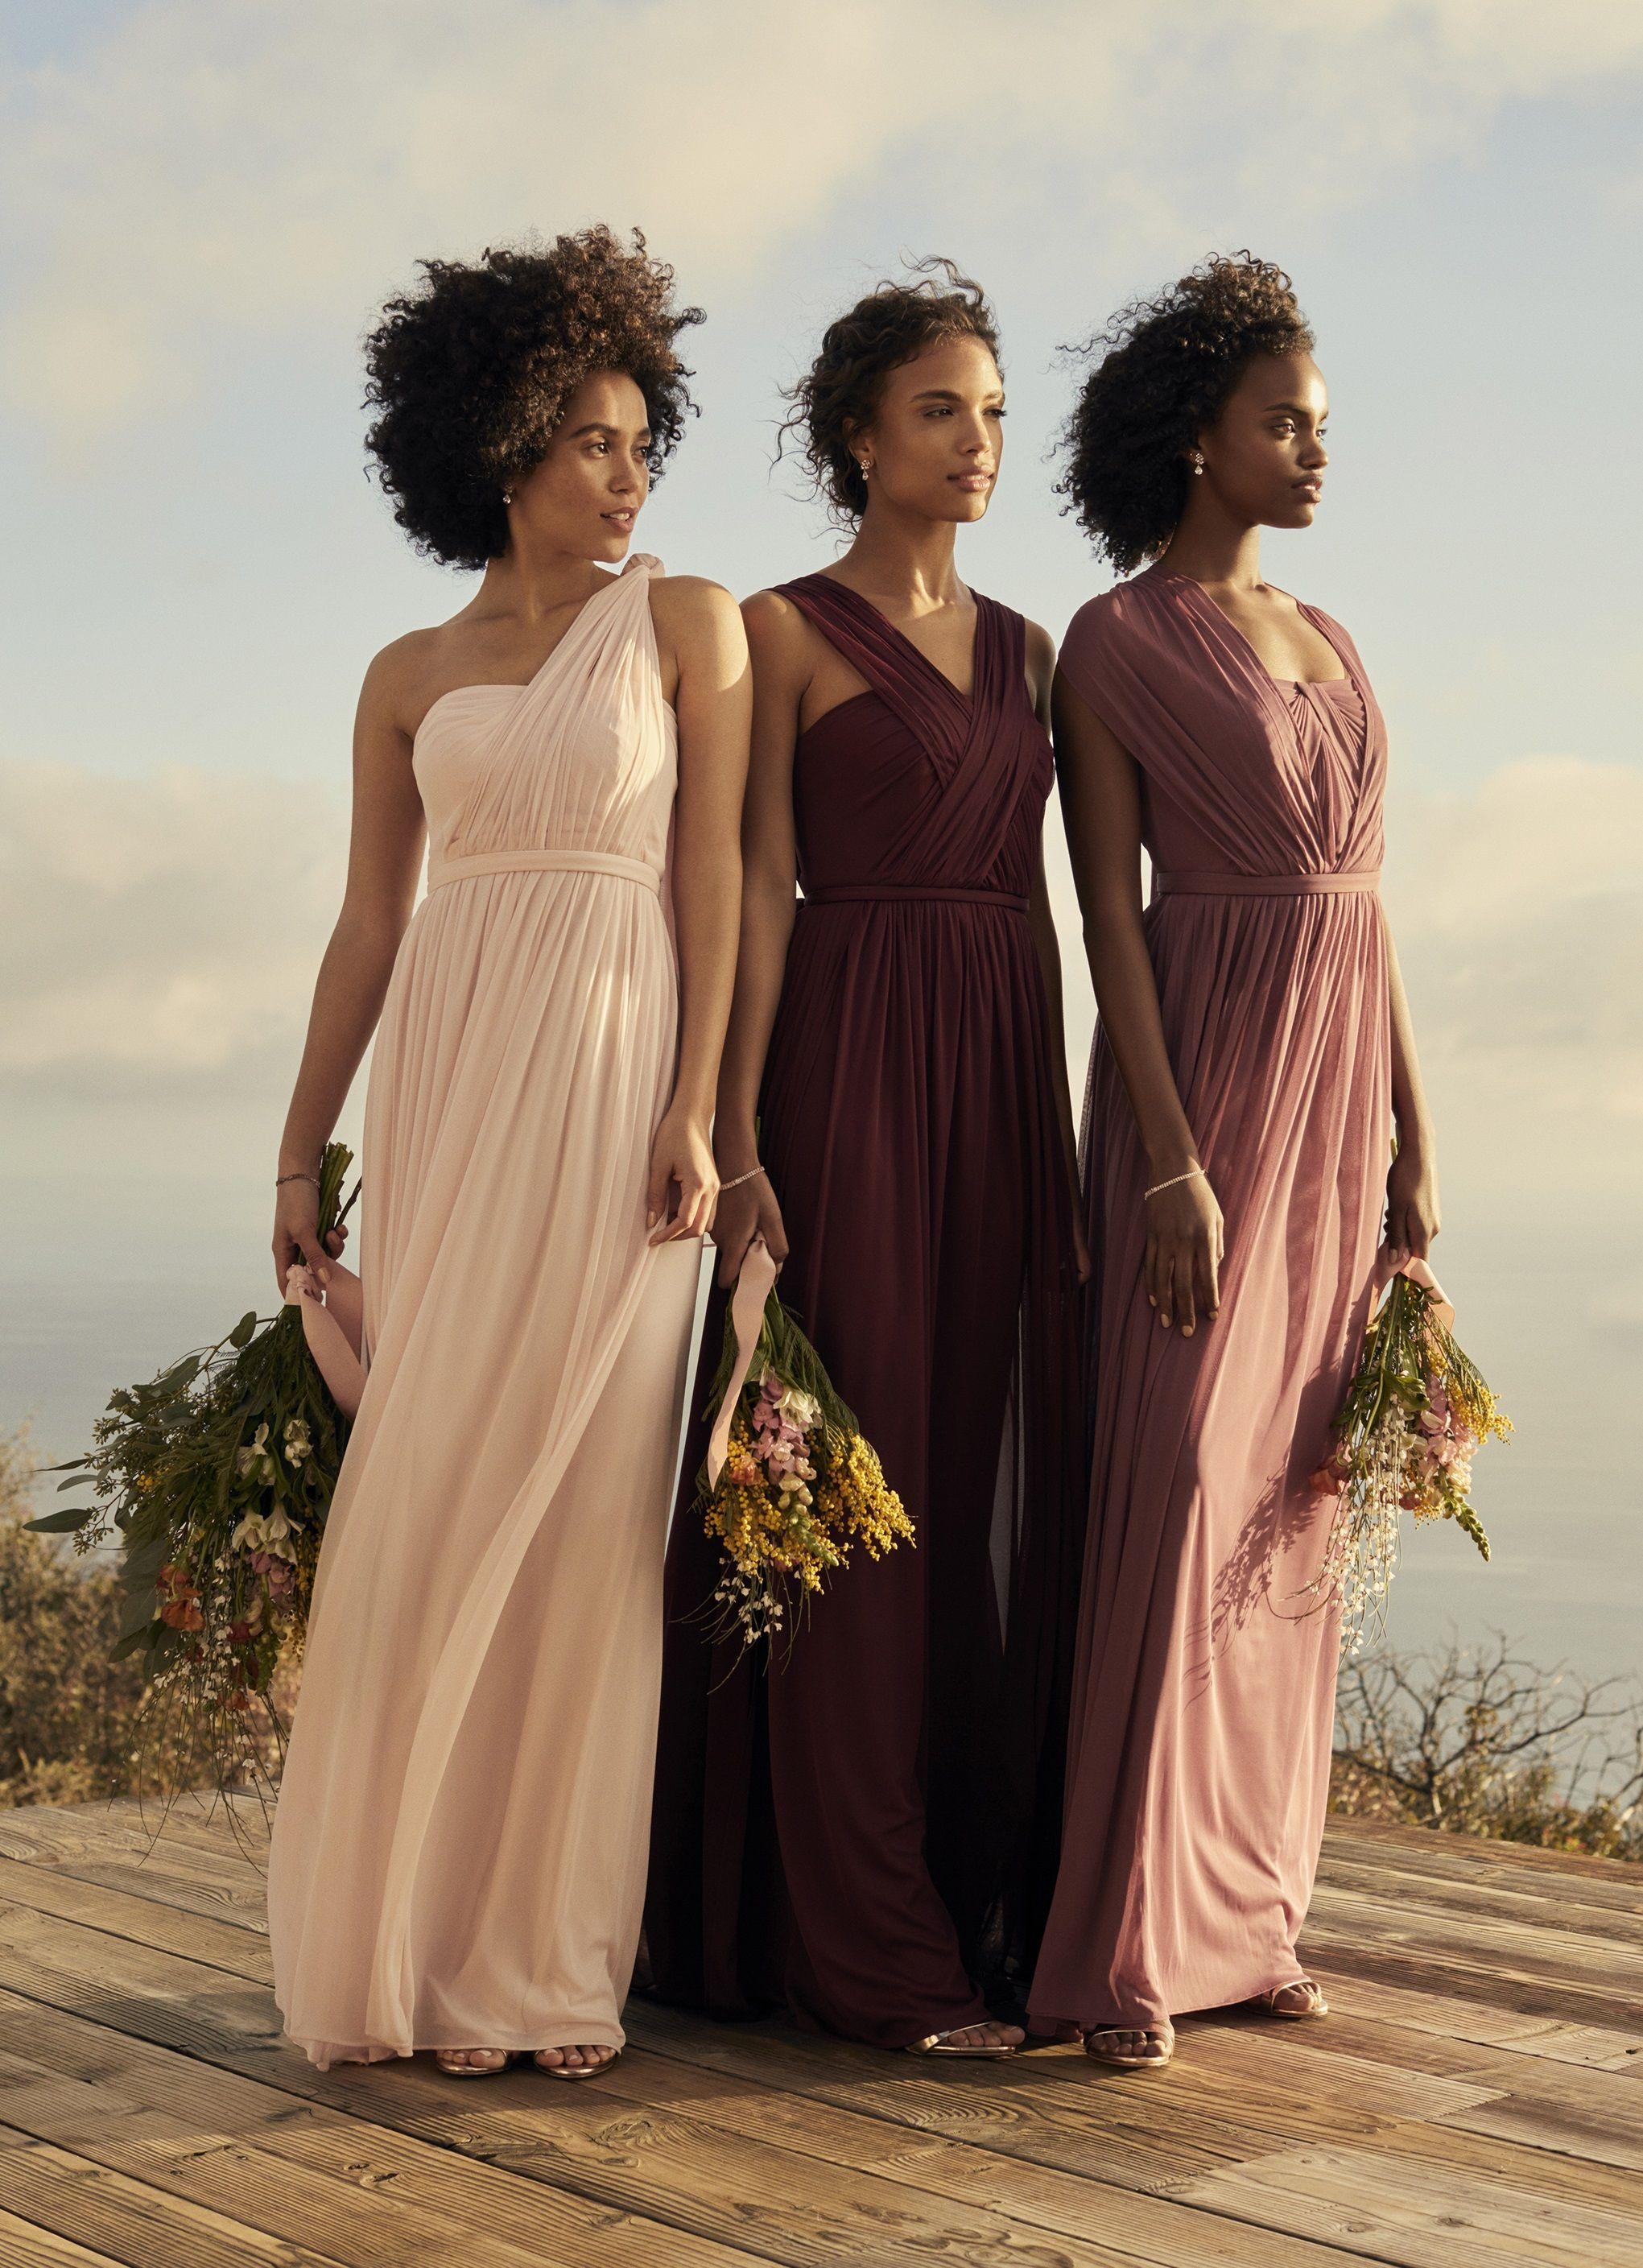 New Wedding Colors to Consider Davids bridal bridesmaid